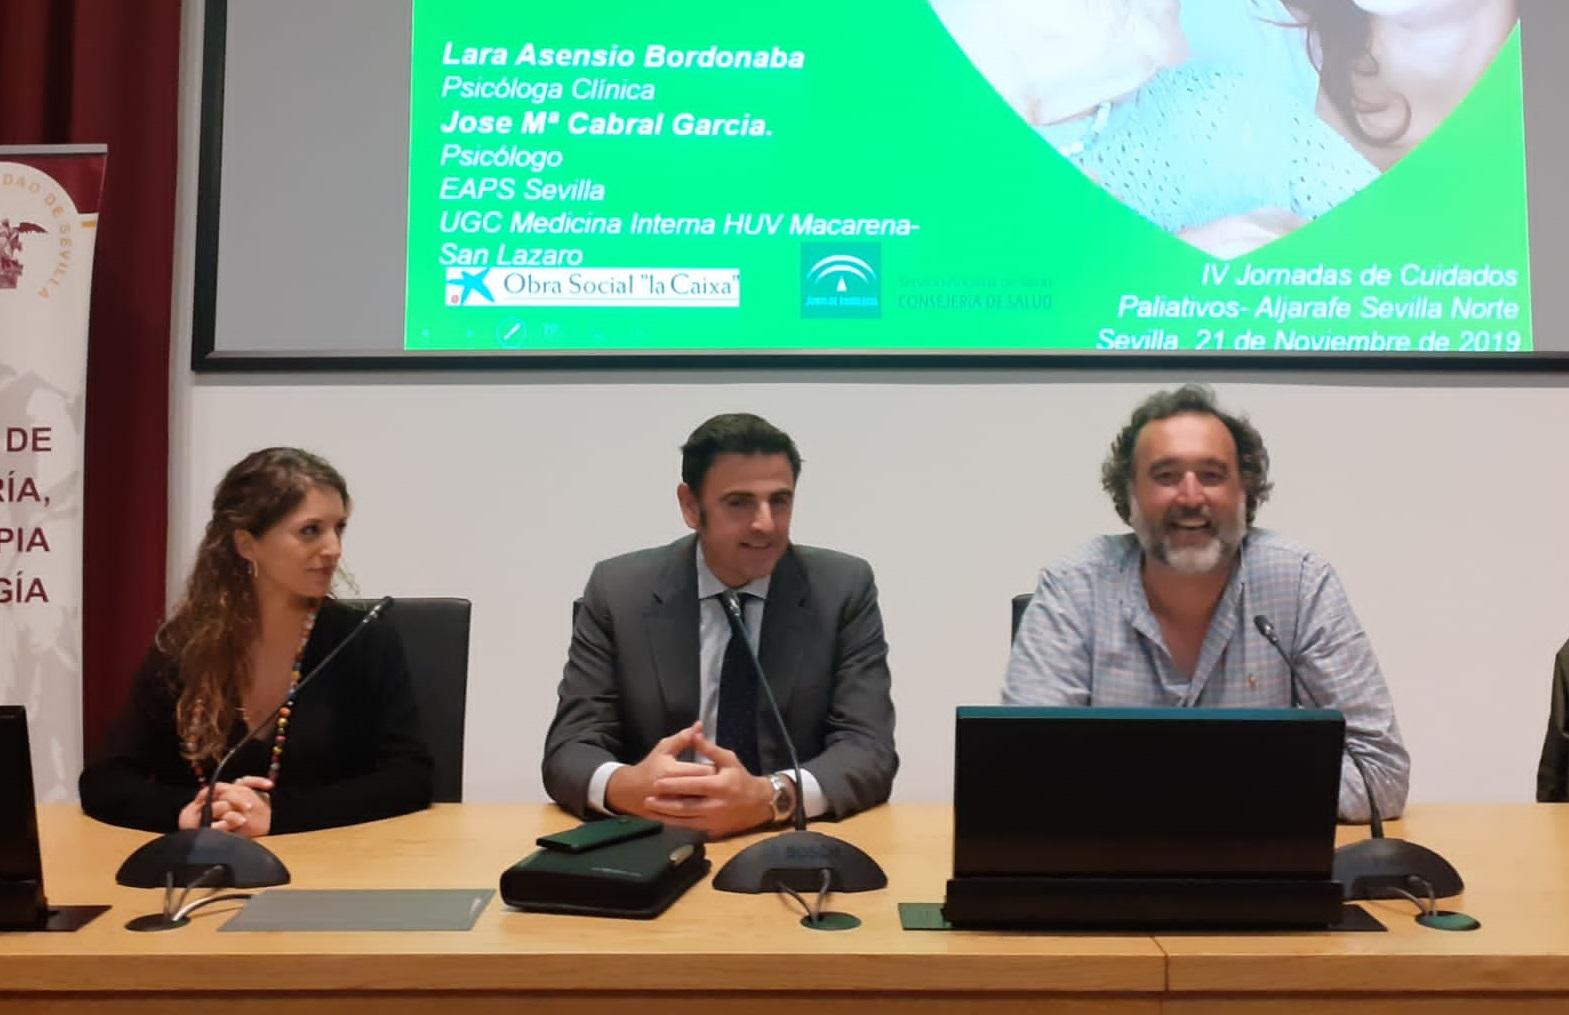 DomusVi EAPS jornada palabras que cuidan Sevilla